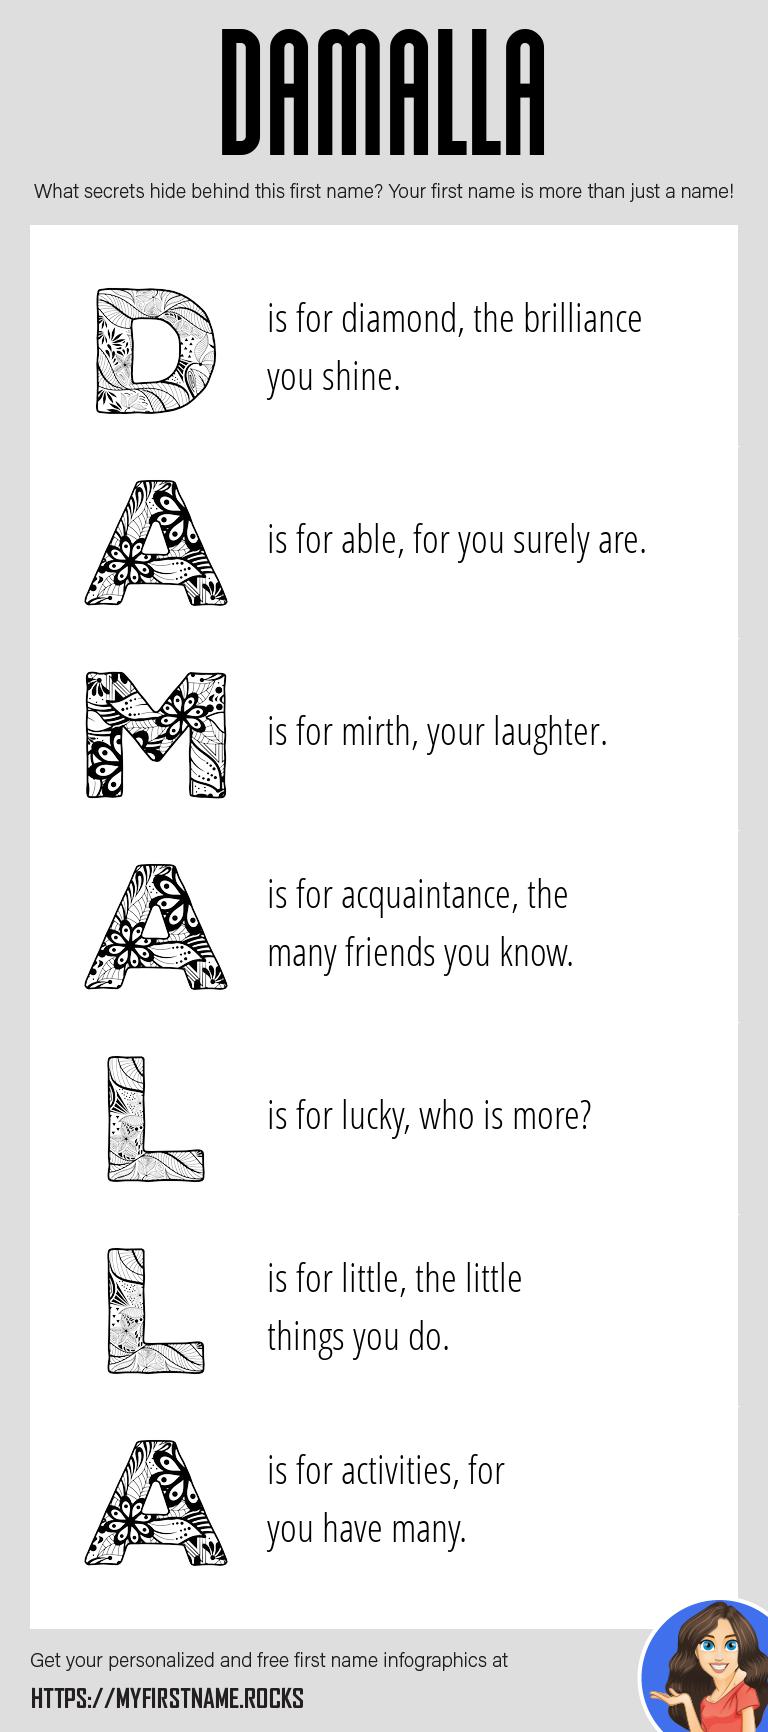 Damalla Infographics